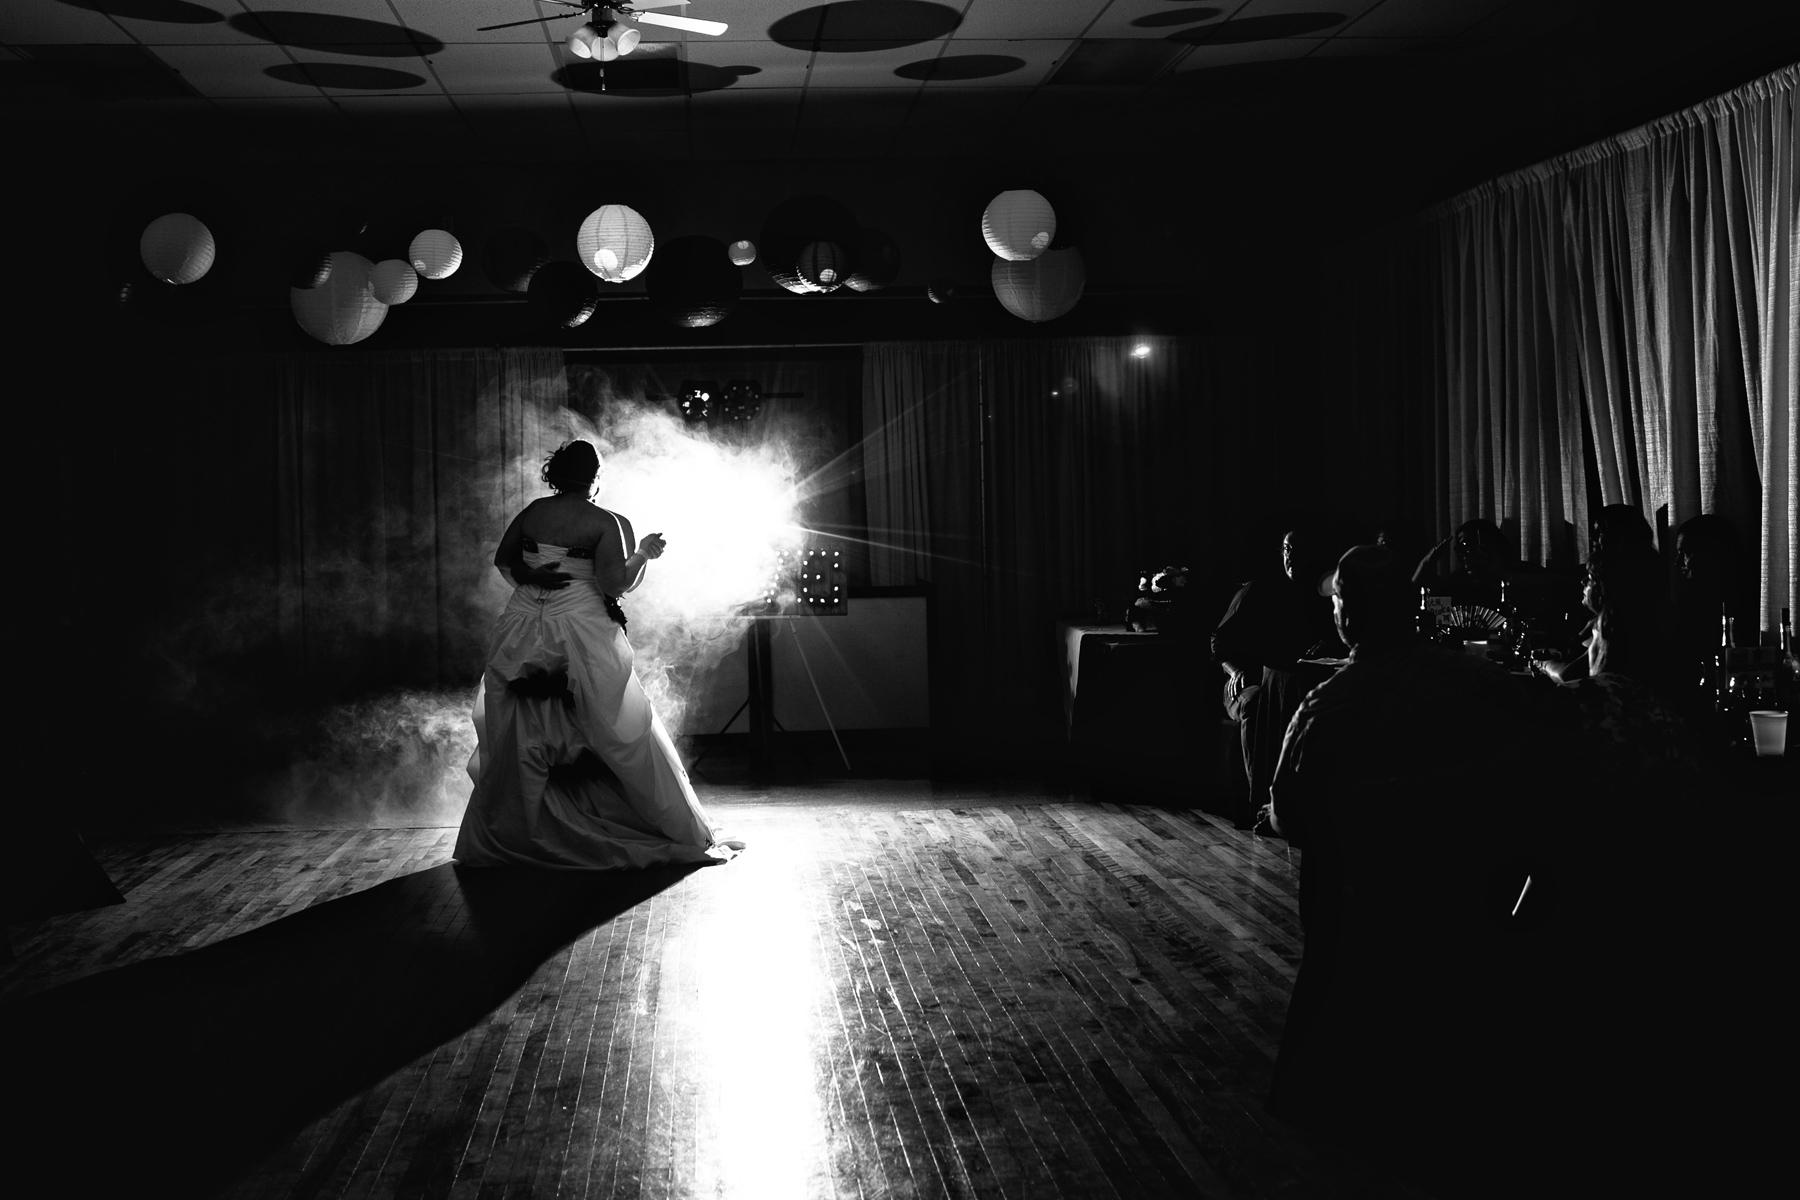 081-awesome-joggins-fossil-wedding-nova-scotia-kandisebrown-jl2016